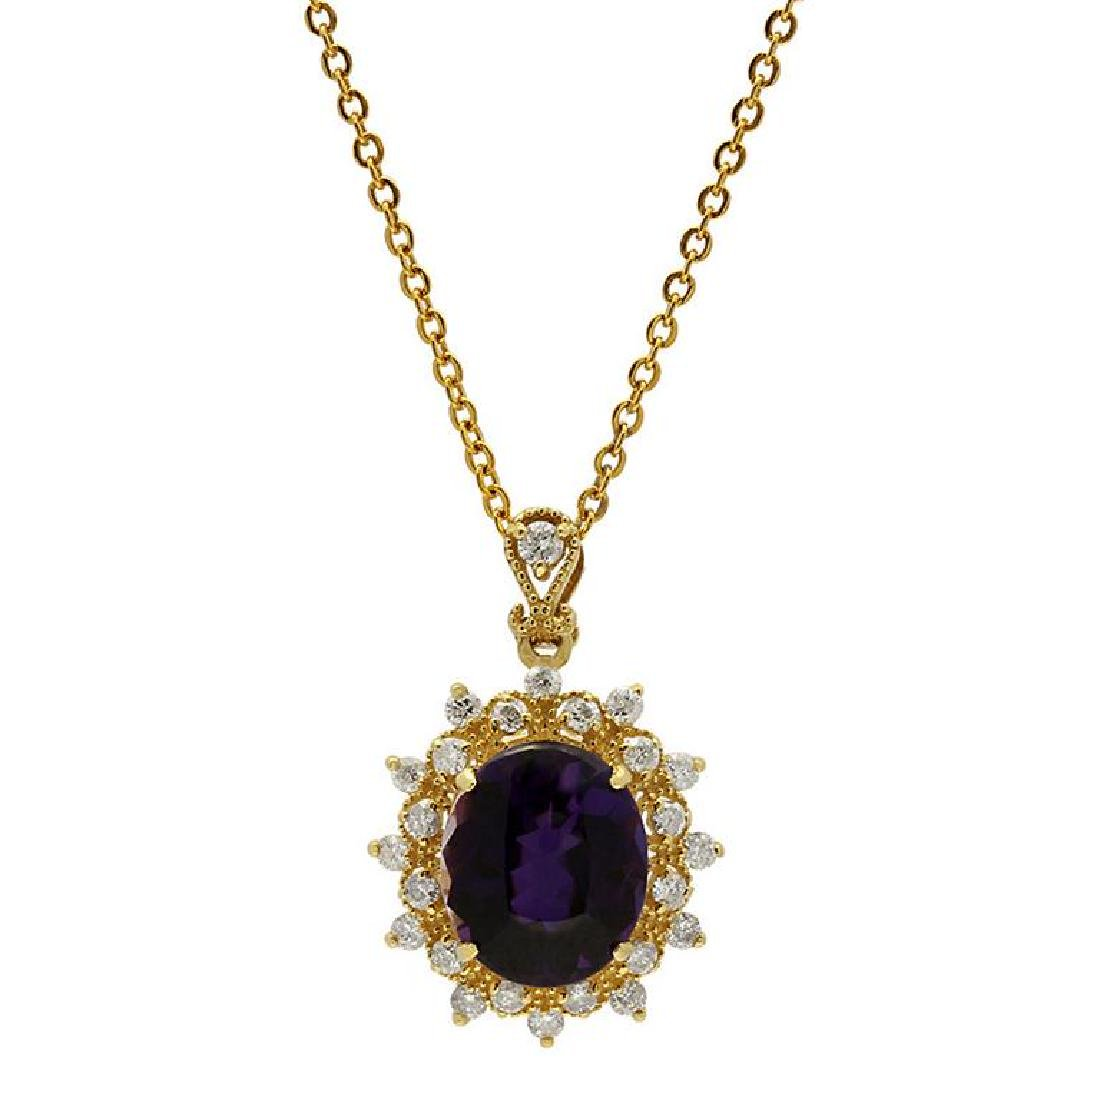 14k Yellow Gold 5.16ct Amethyst 0.73ct Diamond Pendant